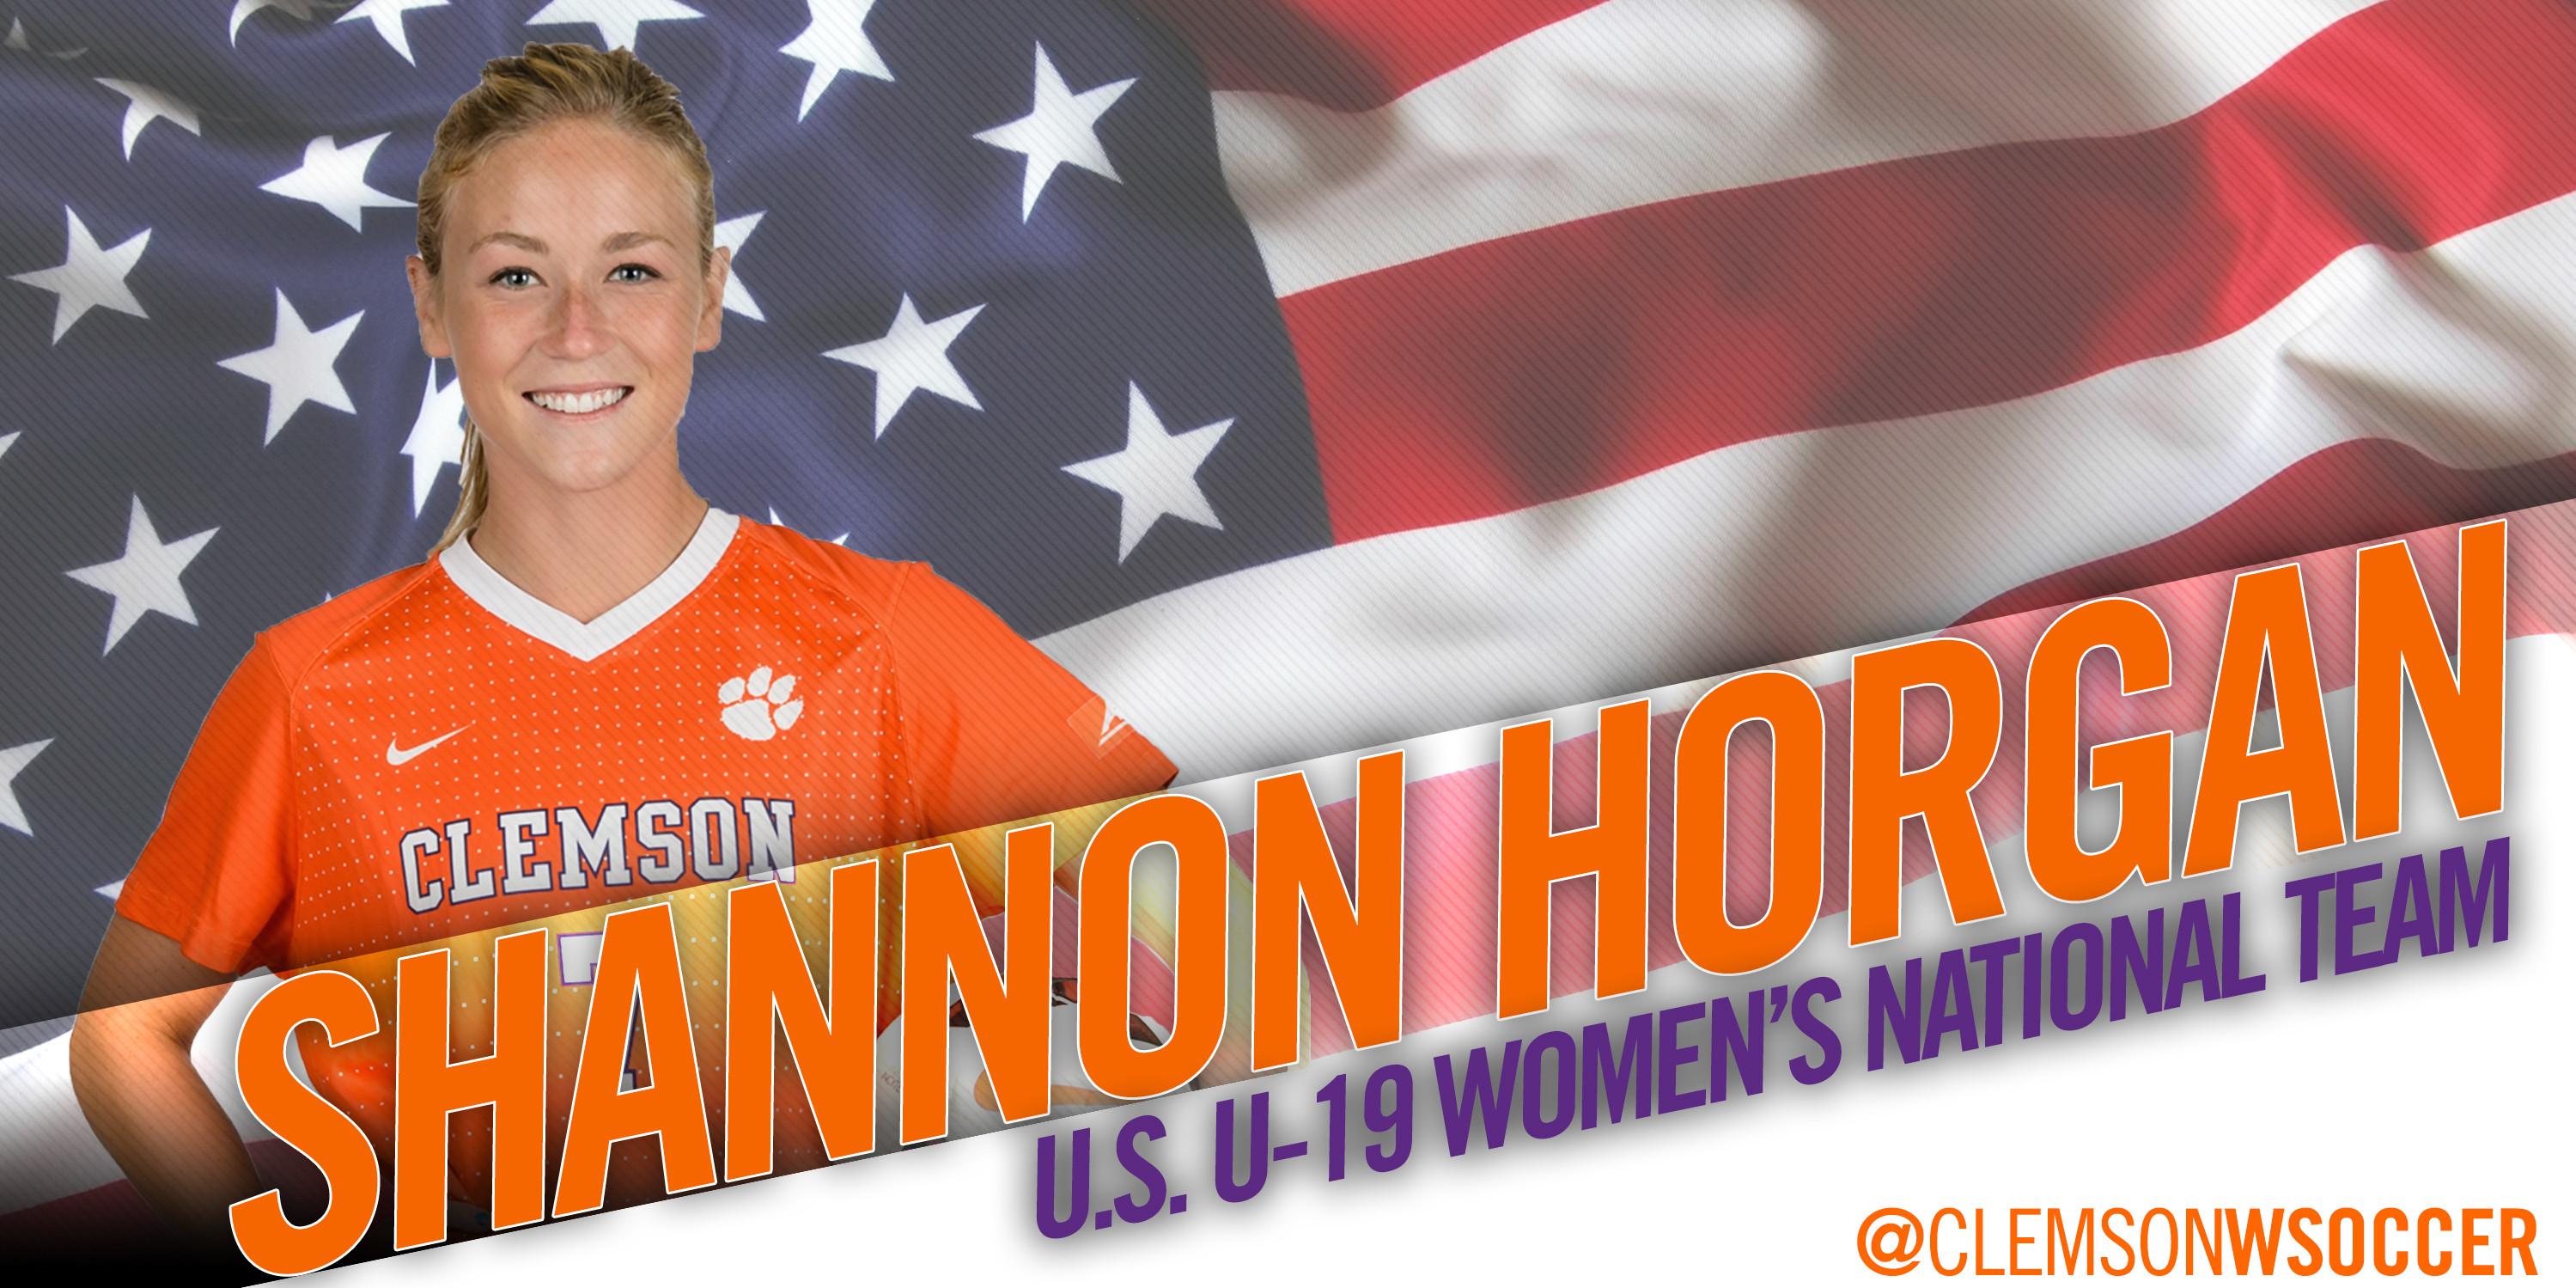 Horgan to travel to New Zealand with U-19 WNT